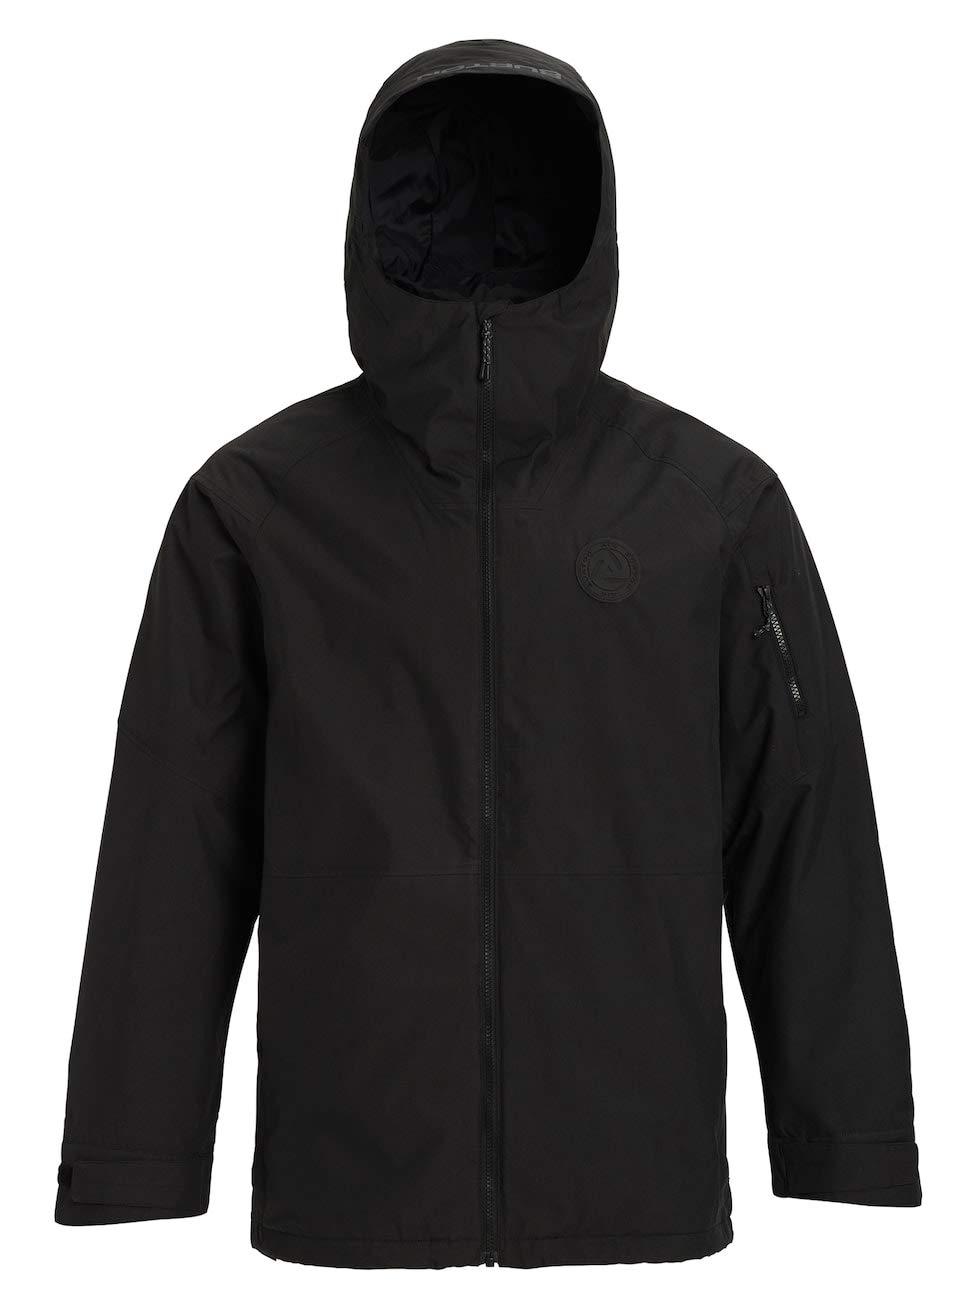 True schwarz XXL Burton Herren Hilltop Snowboard Jacke